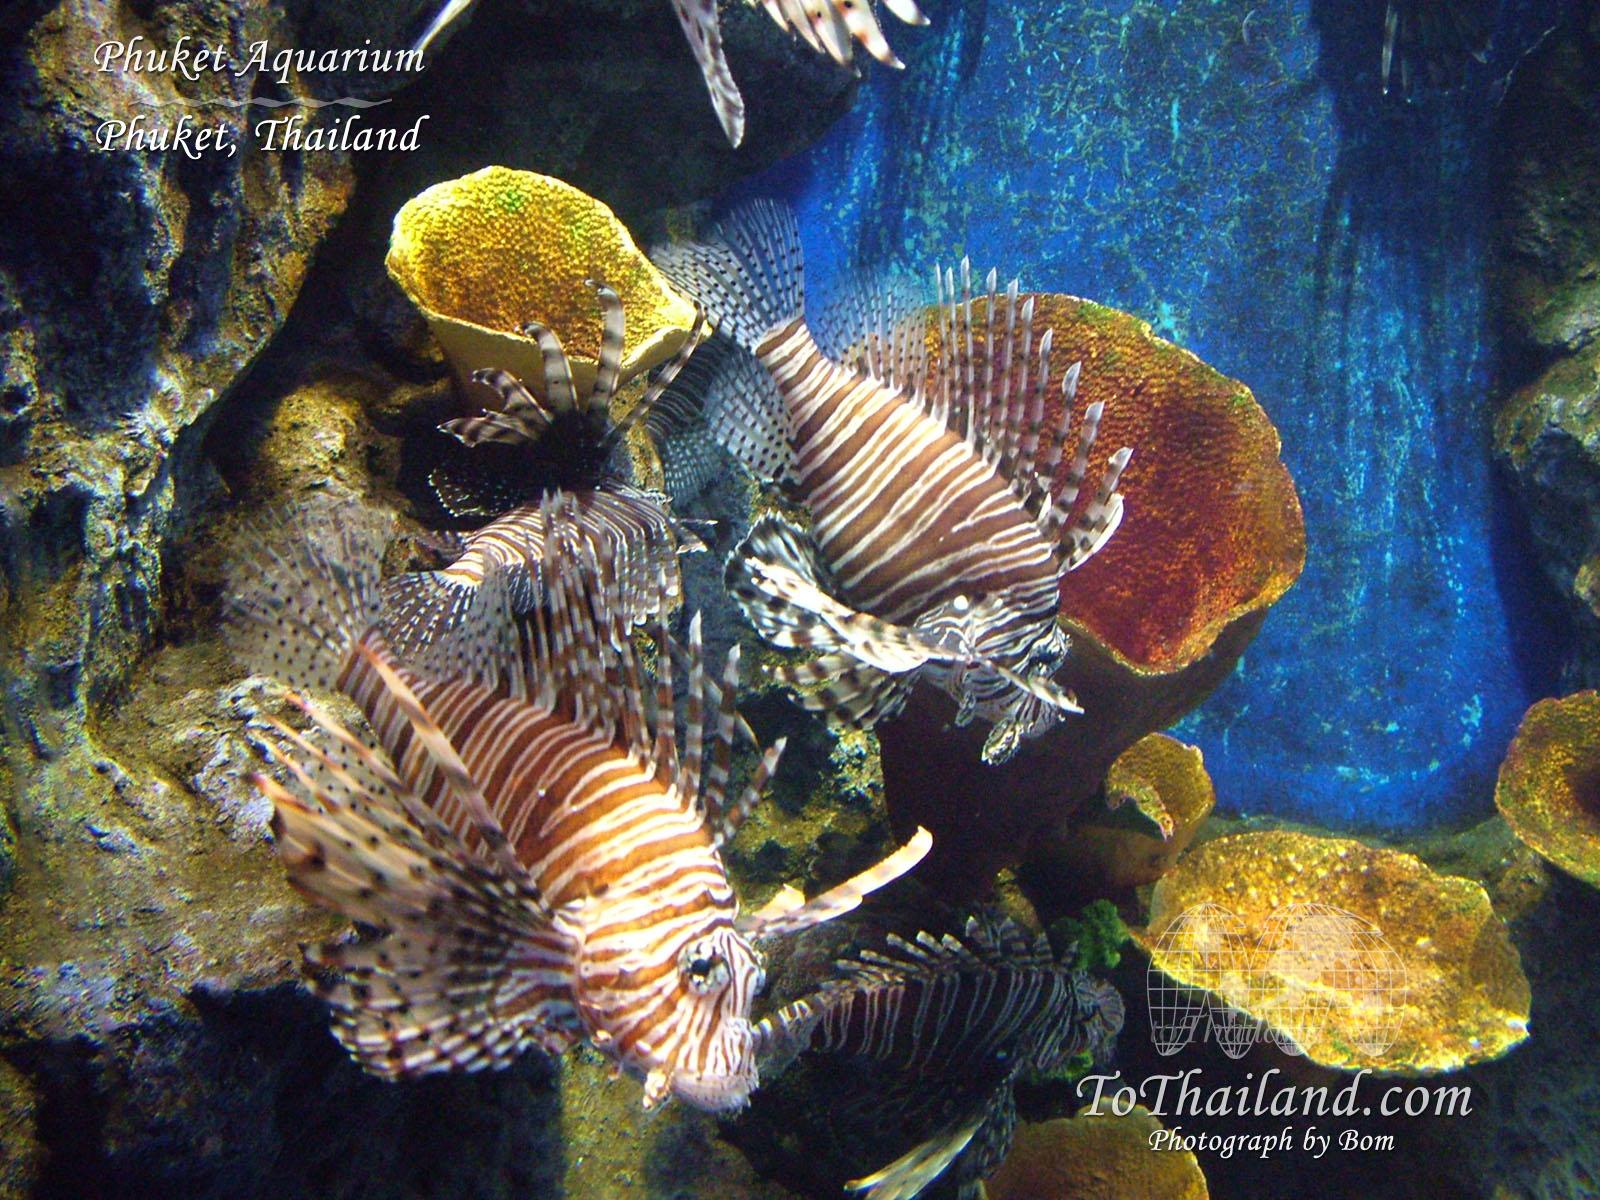 http://2.bp.blogspot.com/_a1oM4gV1bv4/SN25TVHN0OI/AAAAAAAAALc/RdyzKUuXLuM/s1600/phuket_aquarium_marine.jpg